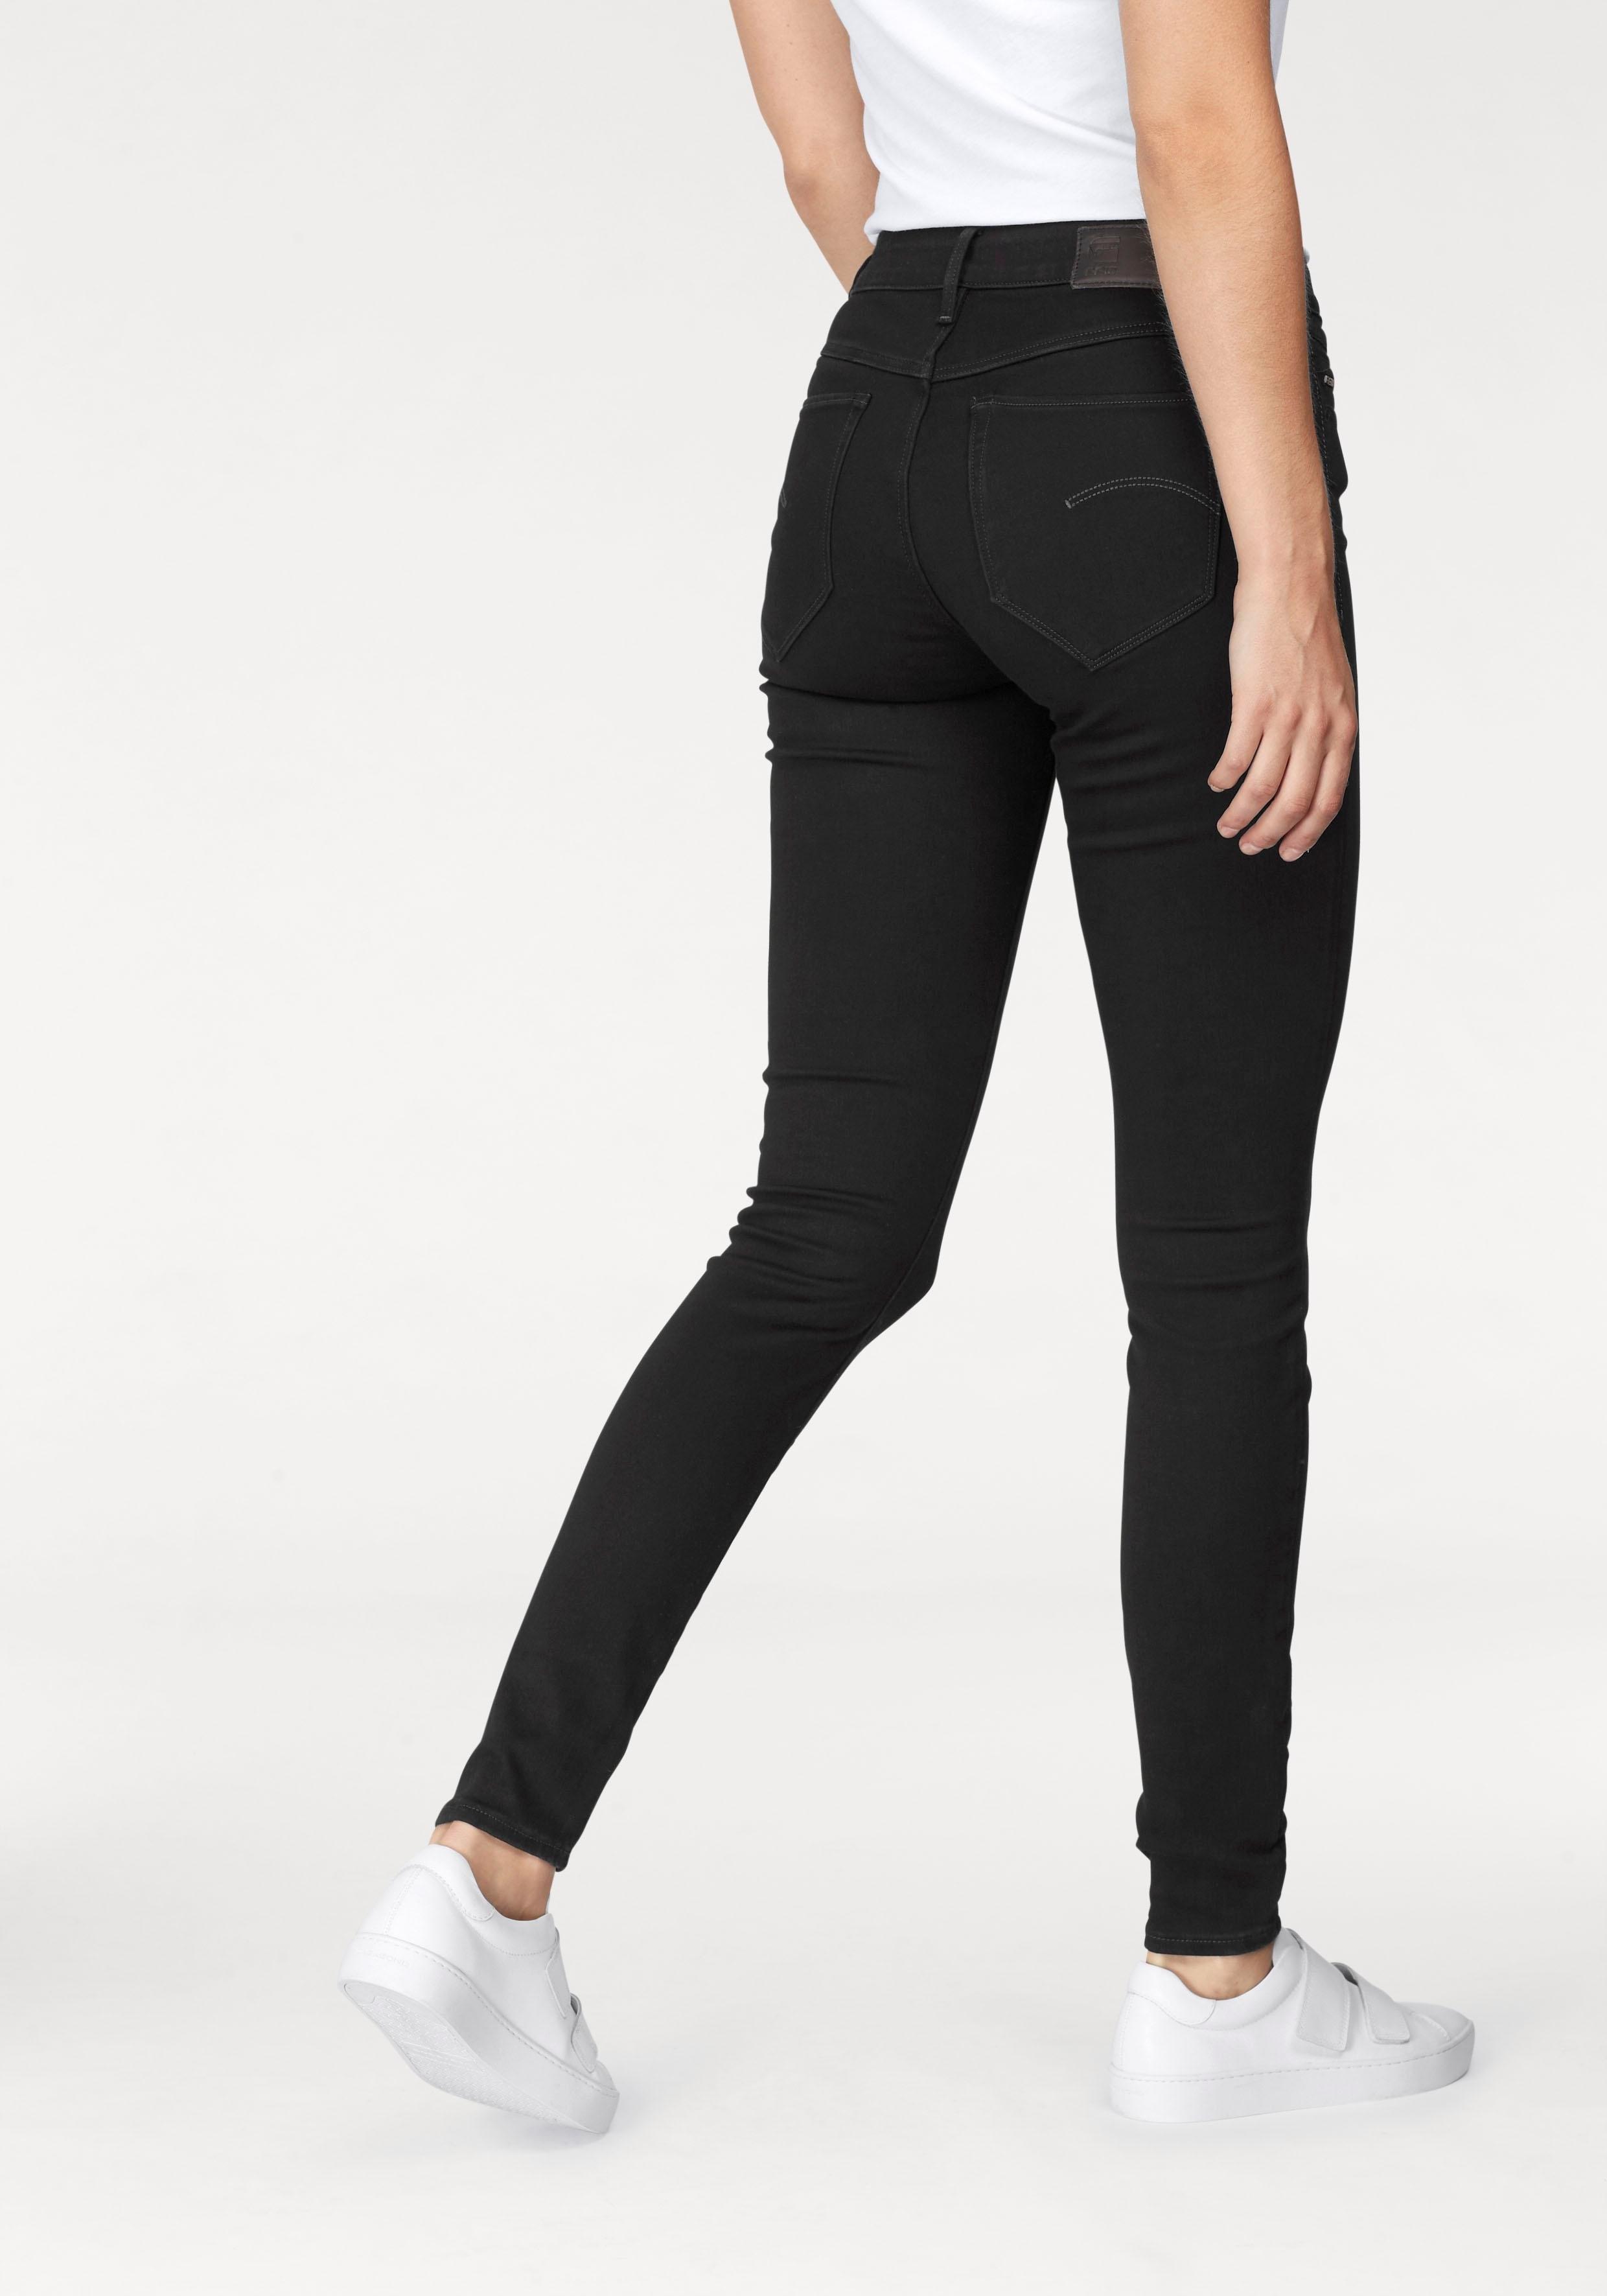 G-star Raw G-Star skinny jeans »Shape High Super Skinny« goedkoop op otto.nl kopen